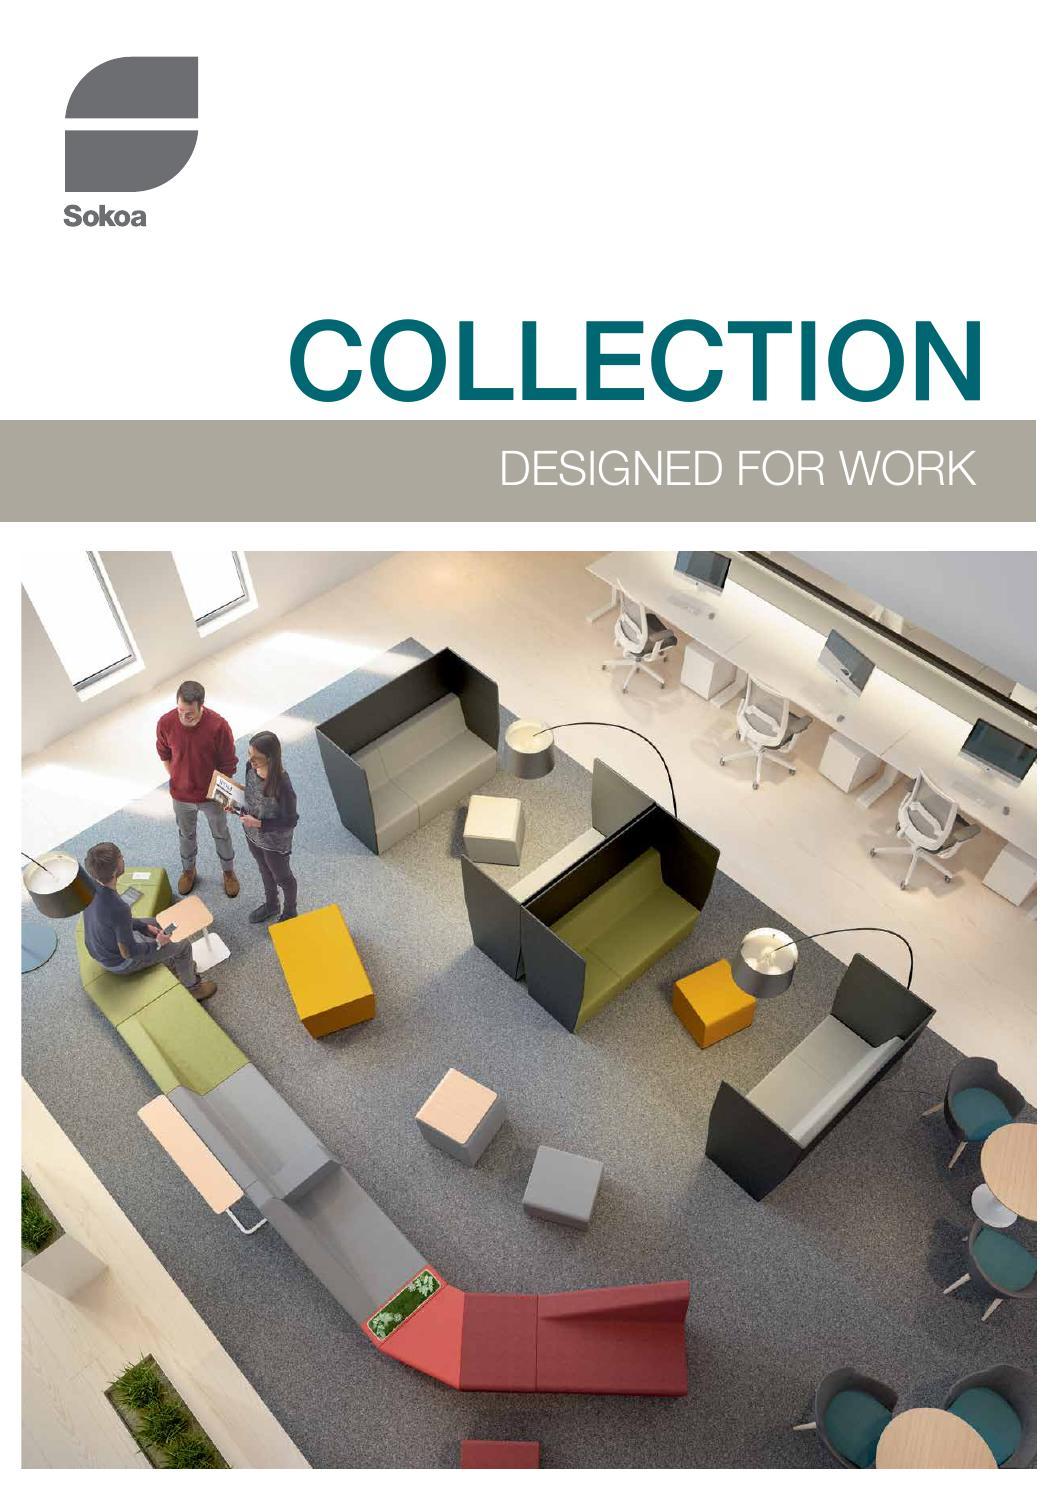 Catalogue collection sokoa 2016 by sokoa hendaye issuu for Sokoa hendaye